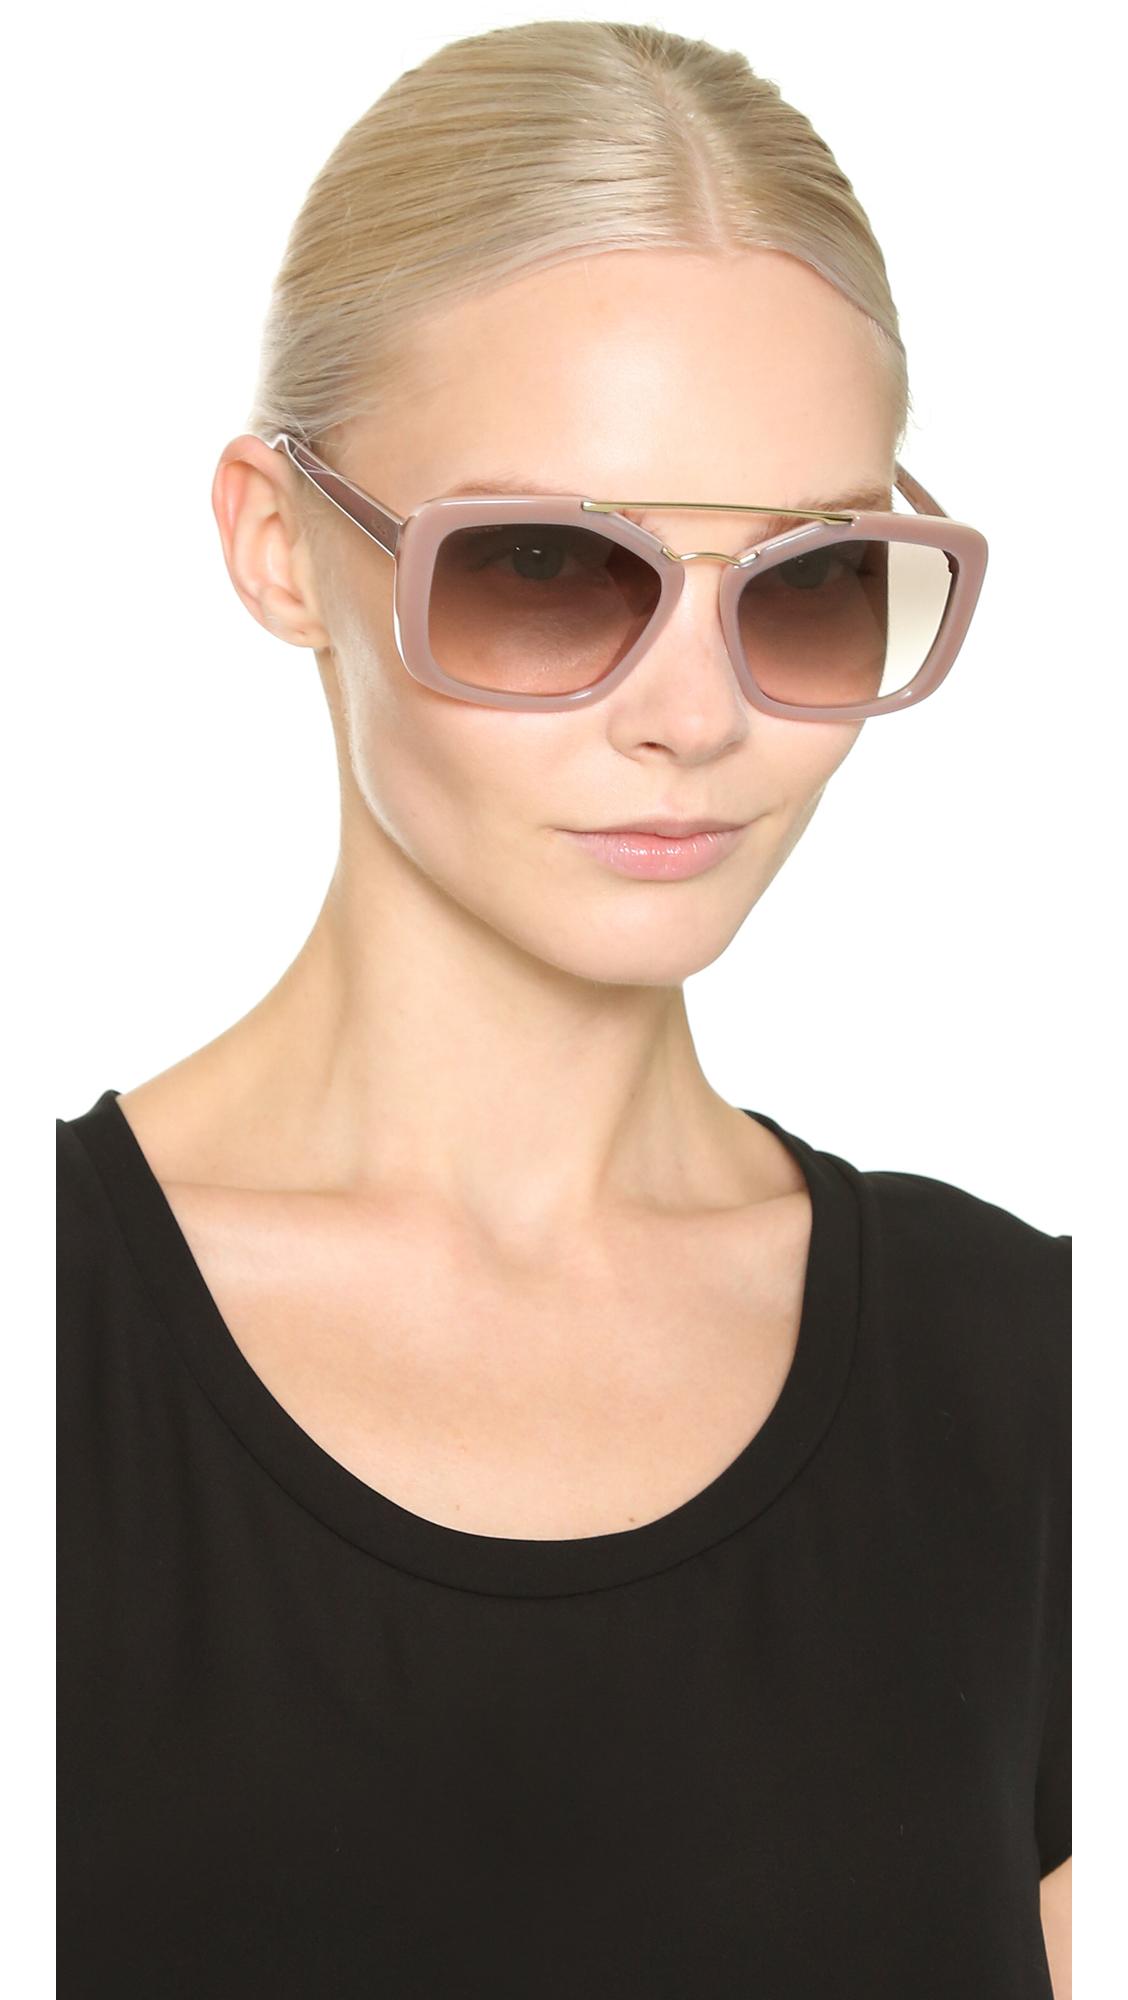 841d0f38d455f Prada Catwalk Aviator Sunglasses